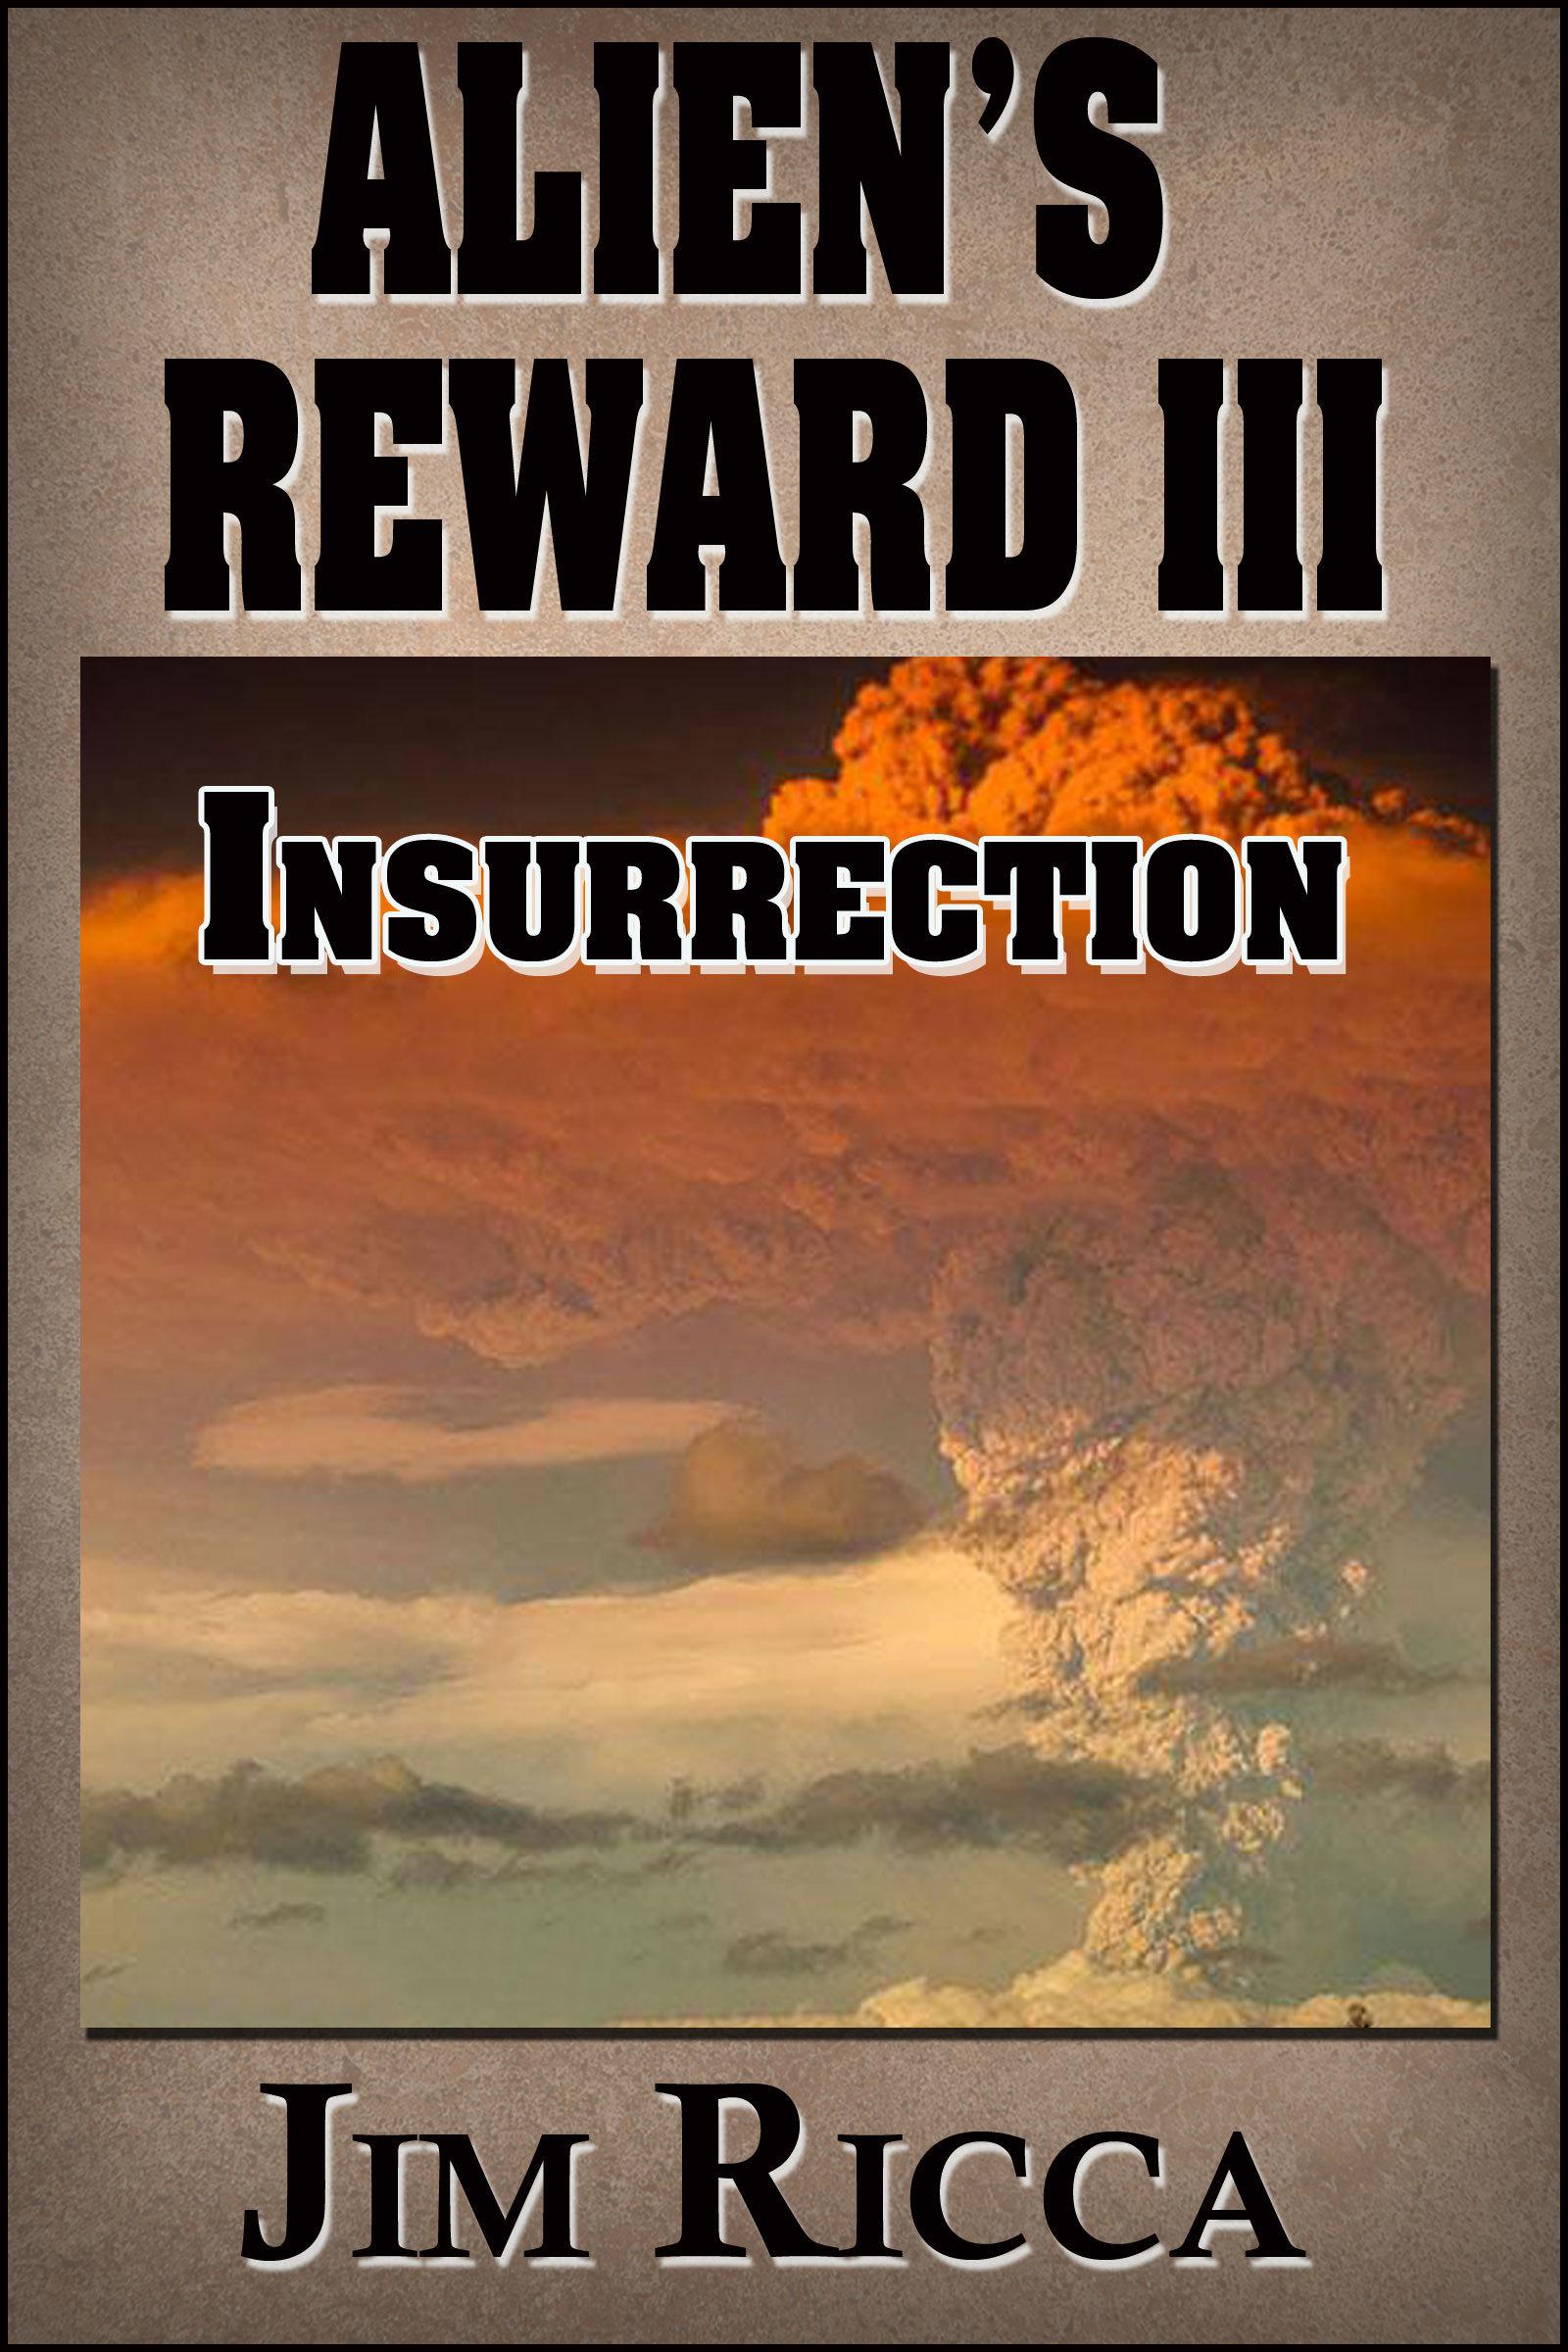 Insurrection (Aliens Reward, #3)  by  Jim Ricca